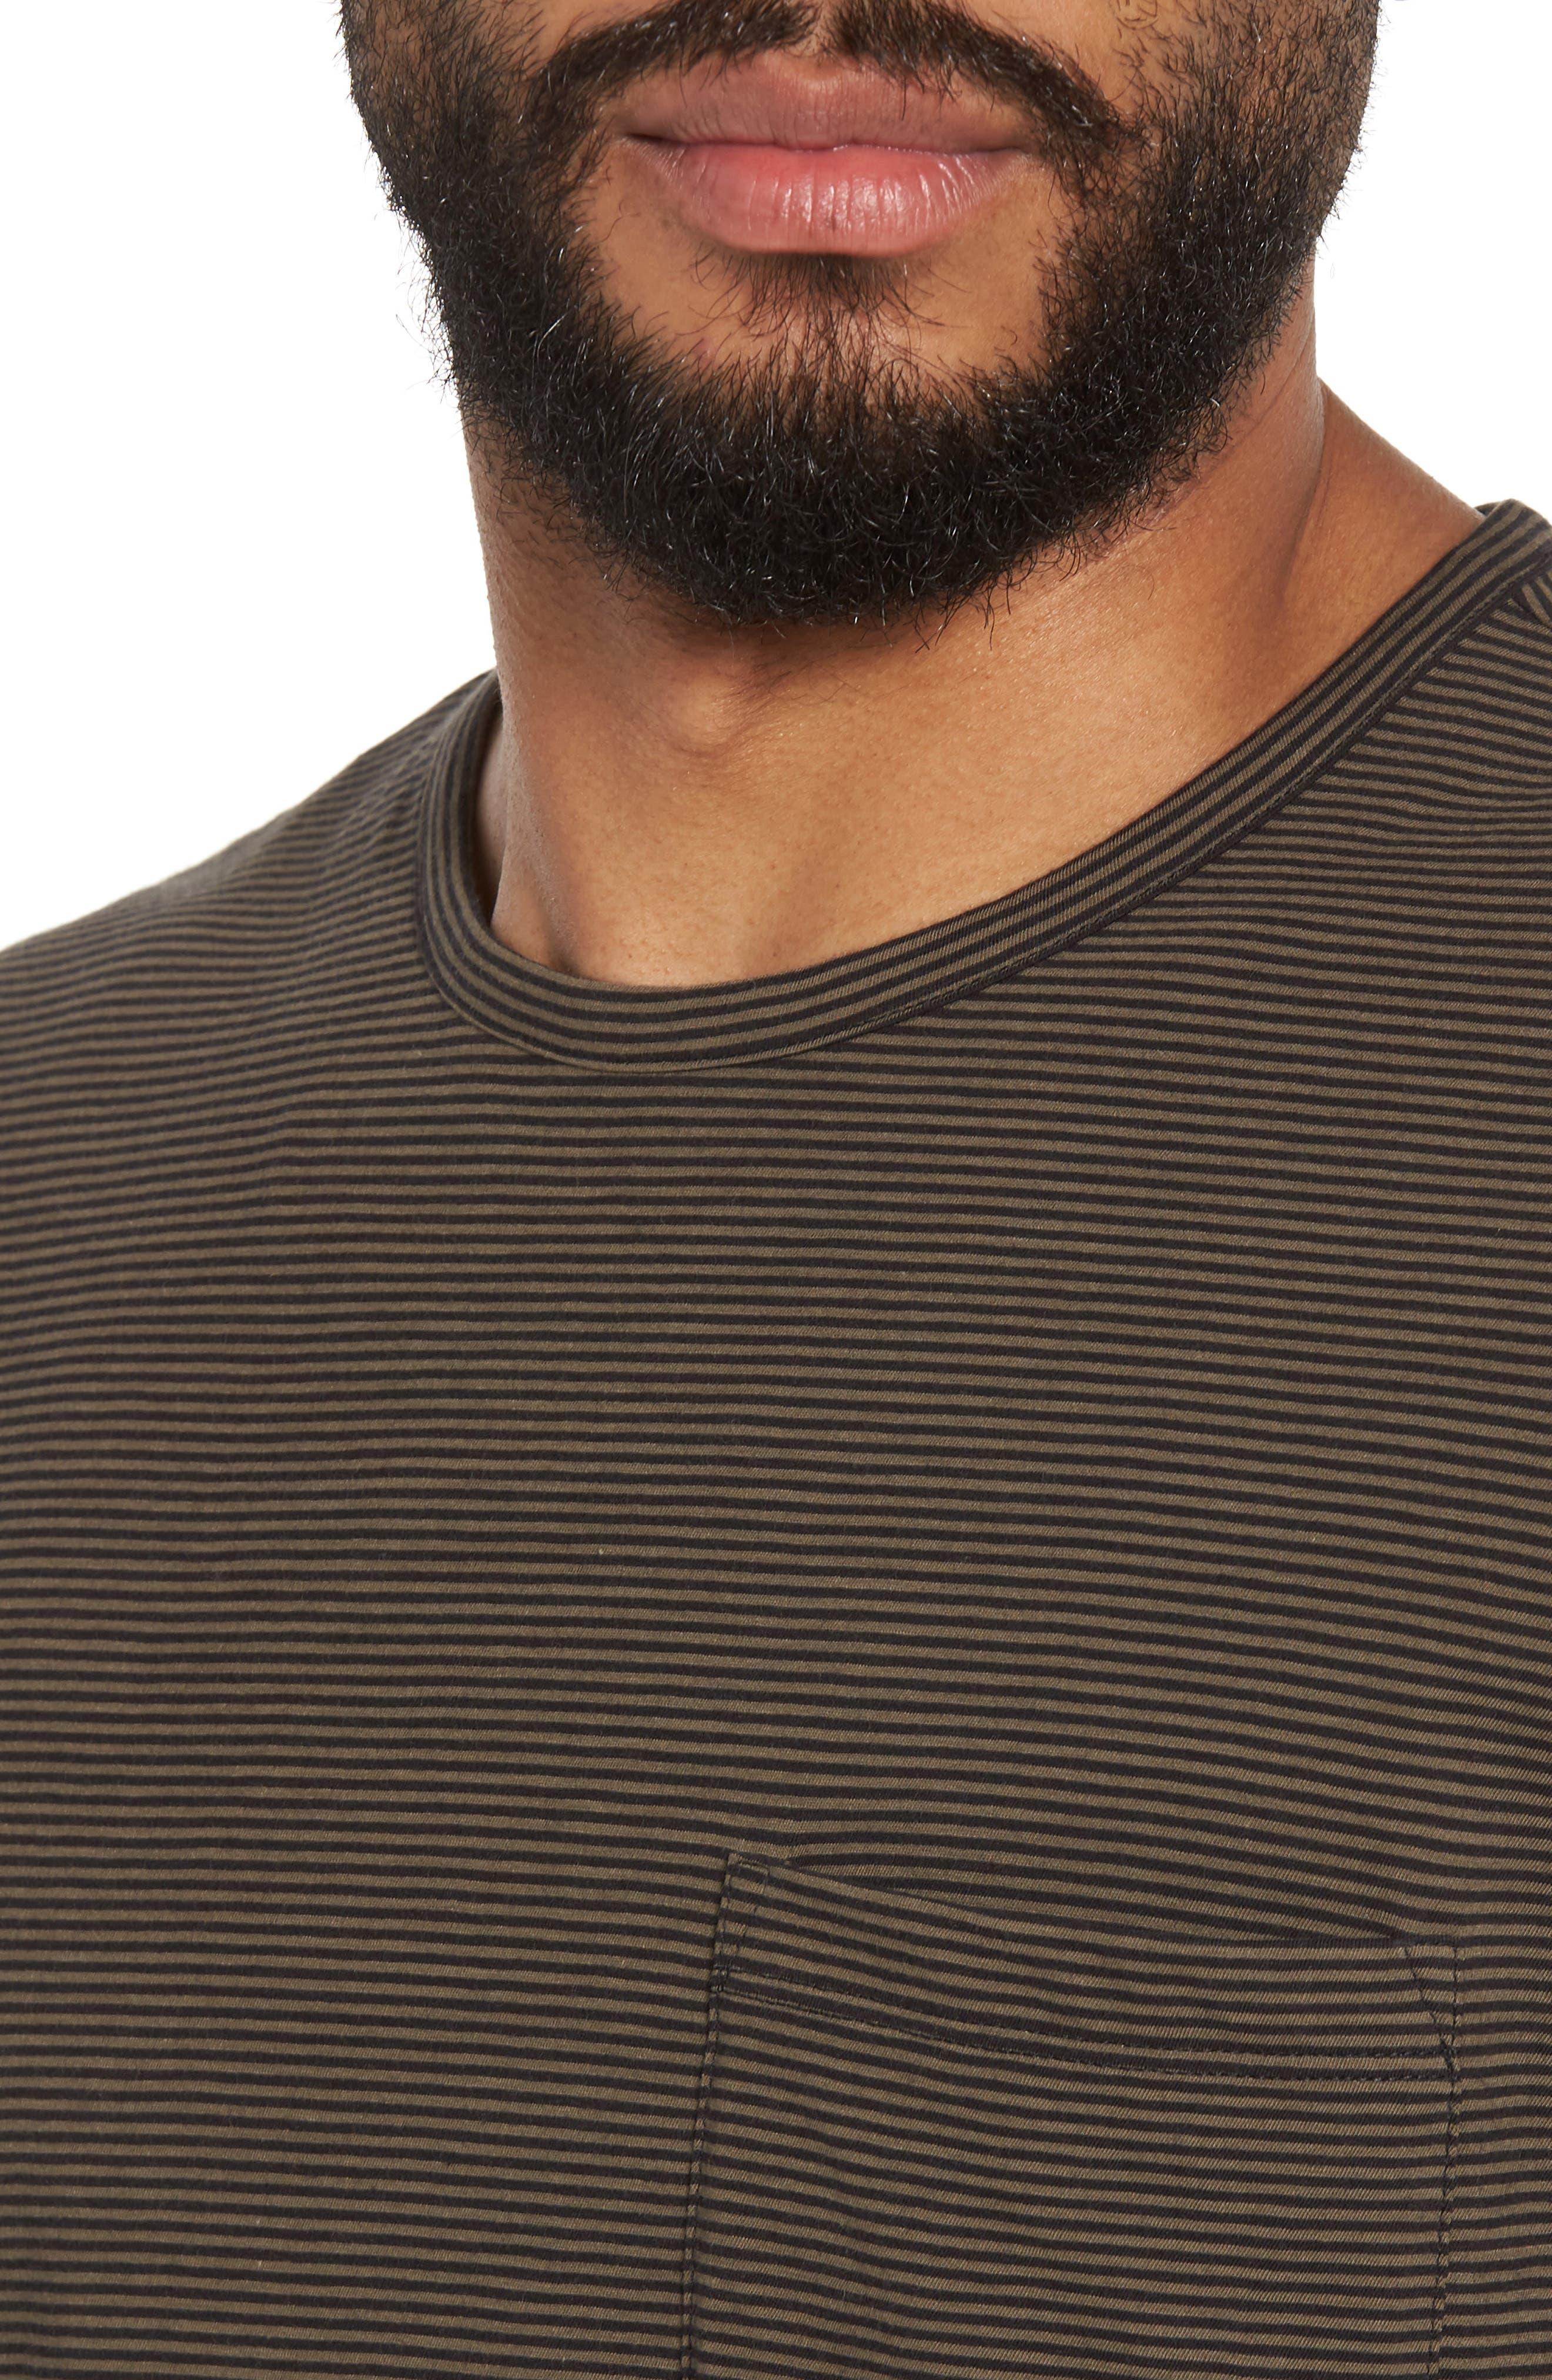 Slim Fit Stripe Pocket T-Shirt,                             Alternate thumbnail 4, color,                             Black/ Camp Green